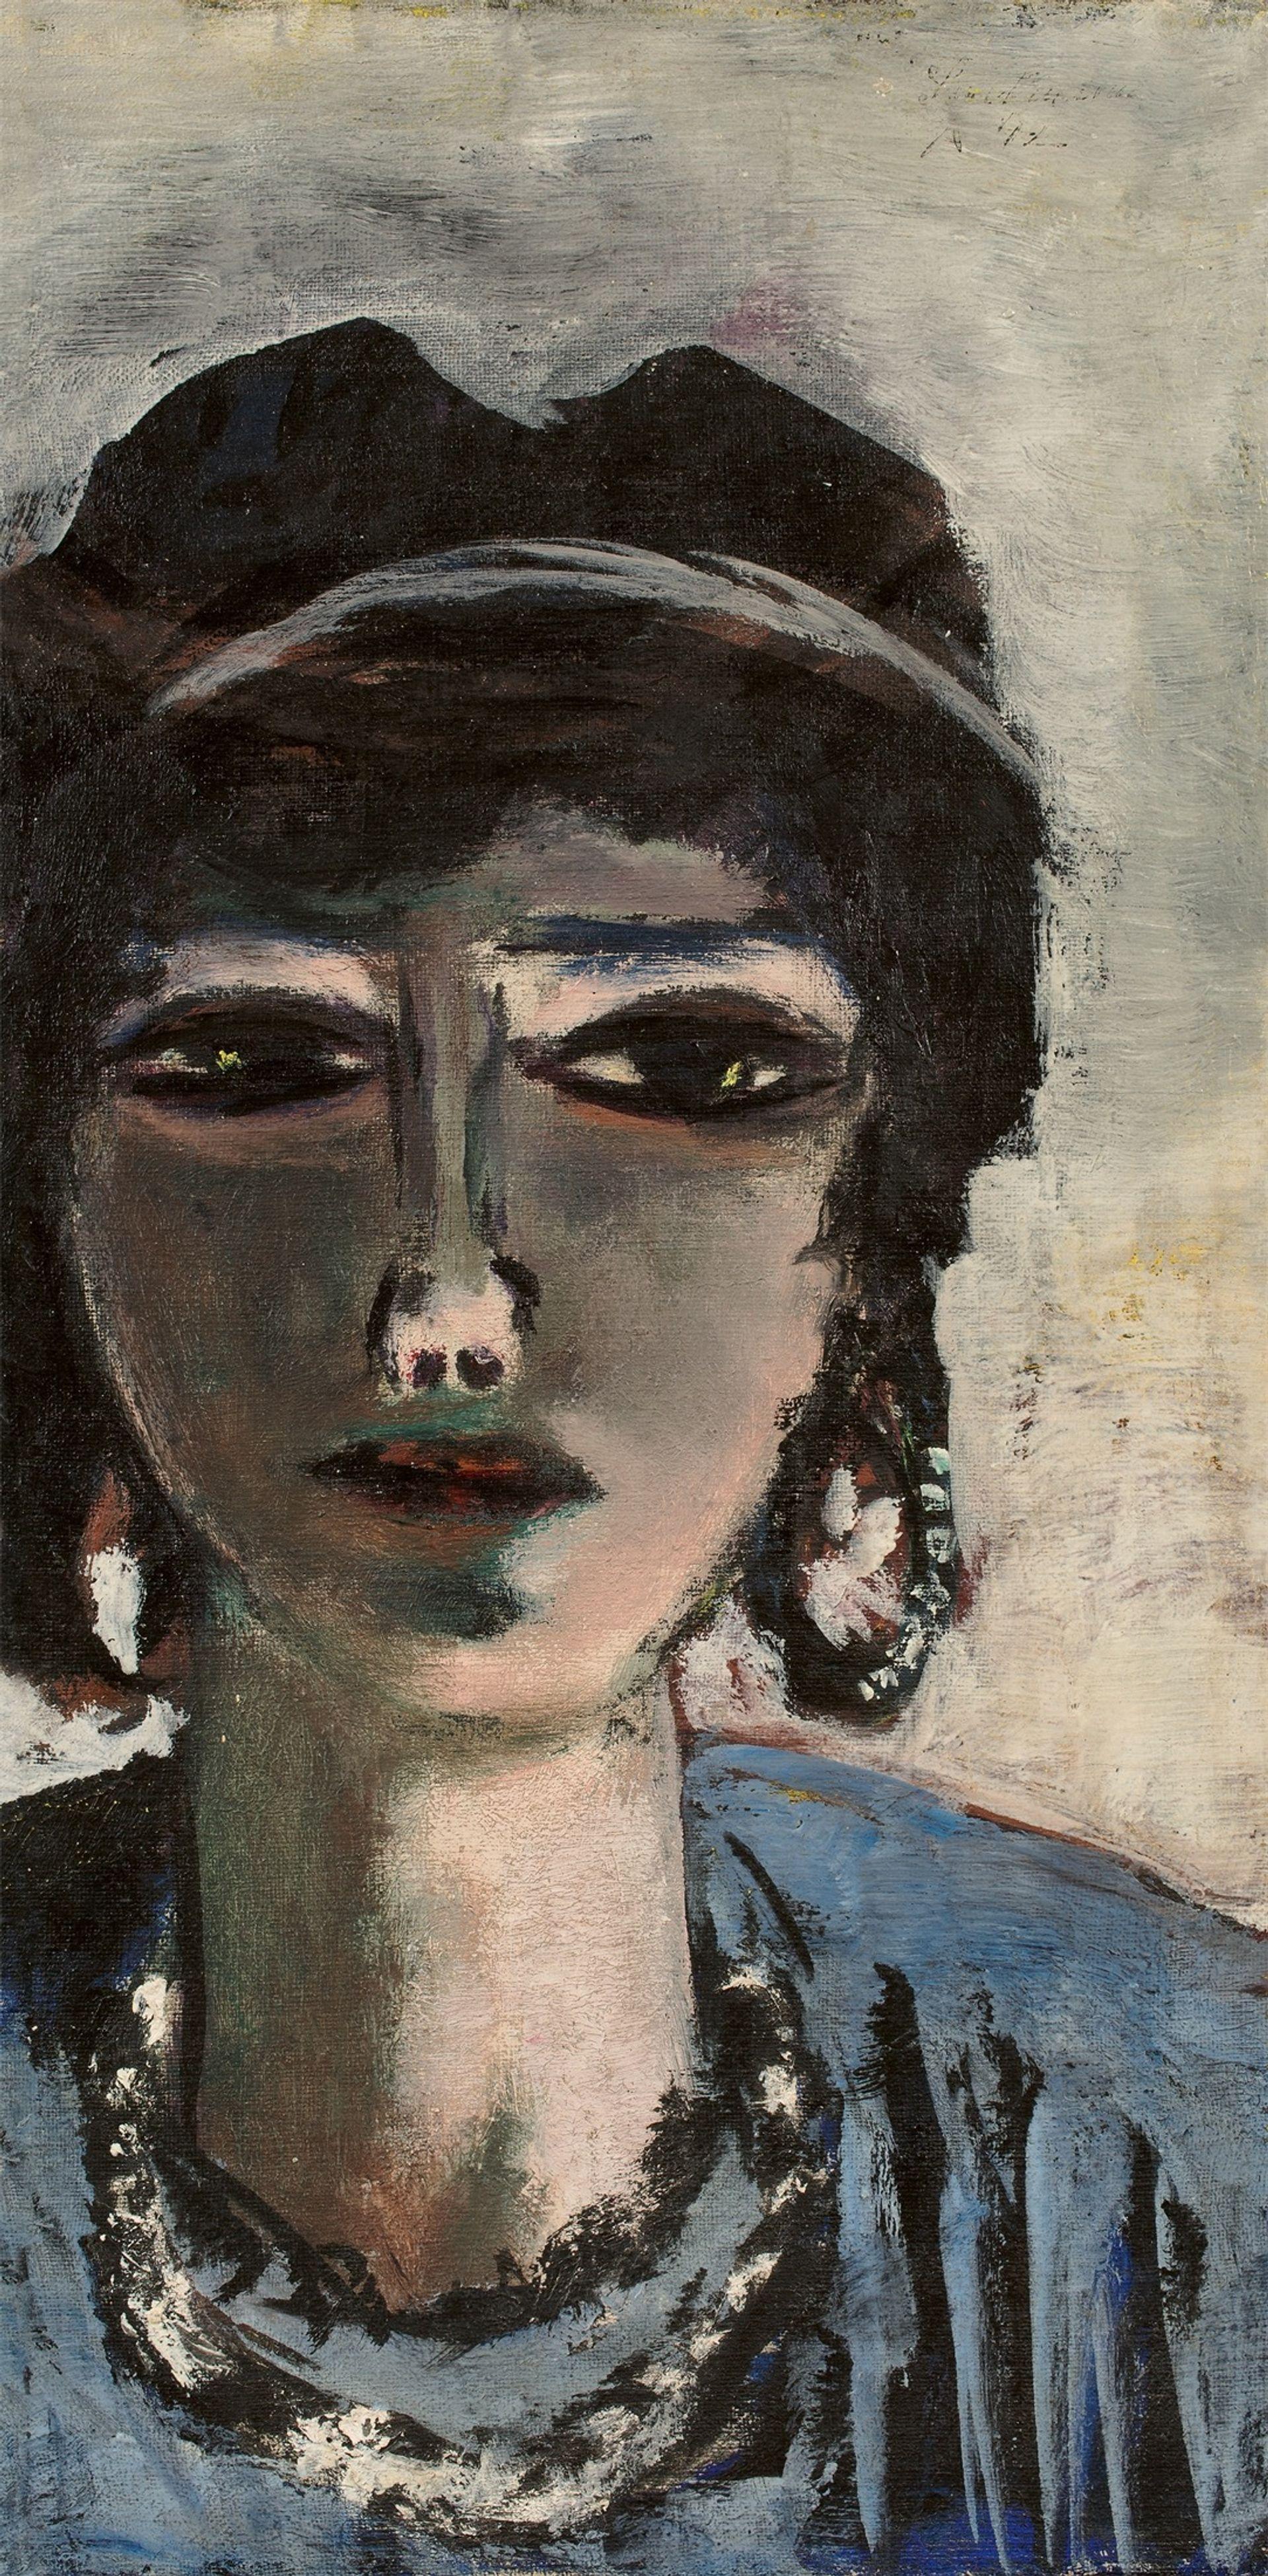 Max Beckmann, The Egyptian Woman  (1942) Courtesy of Villa Grisebach